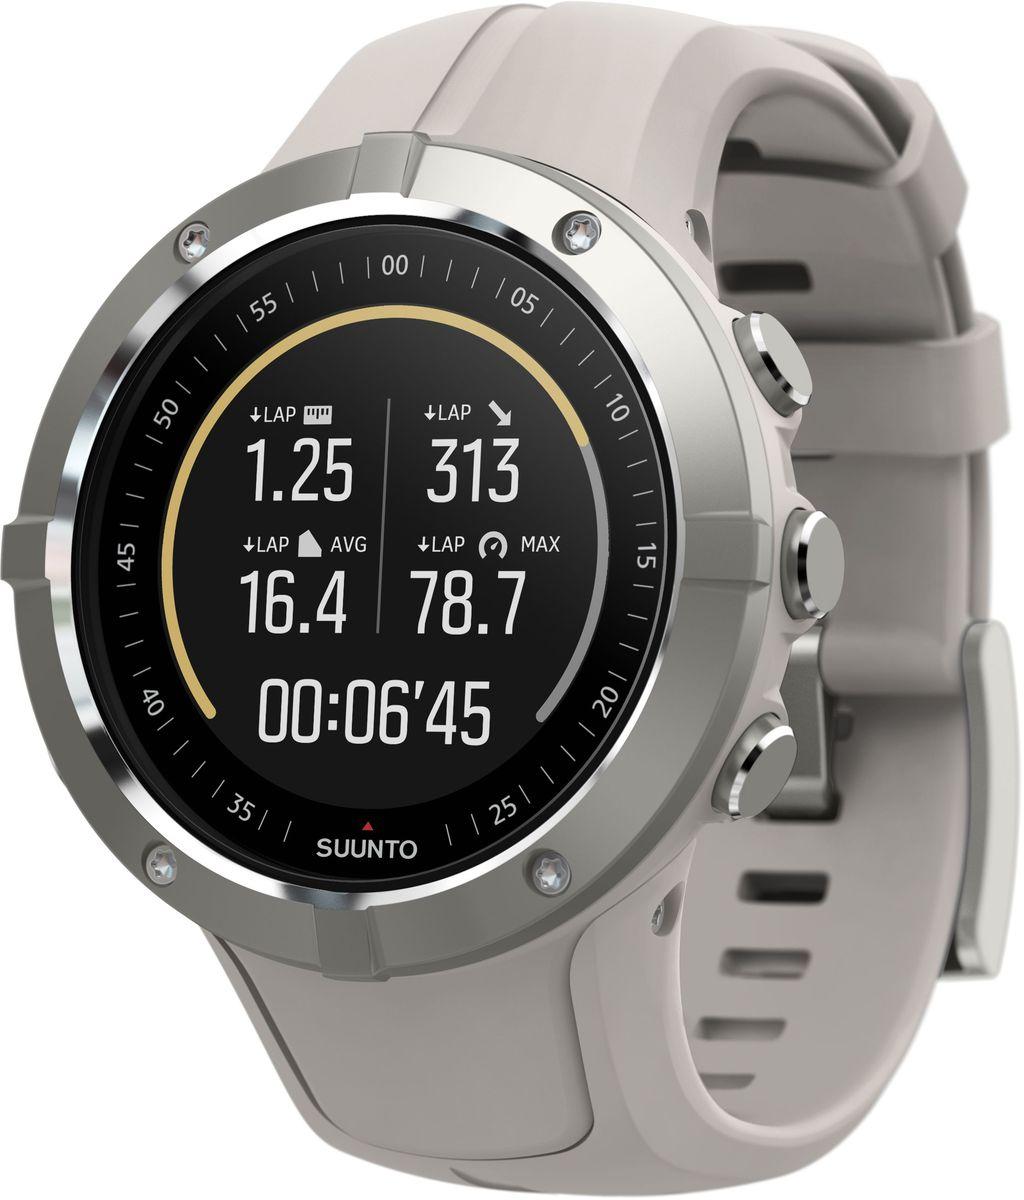 Часы спортивные Suunto  Spartan Trainer Wrist HR Sandstone , цвет: серый, черный - Умные часы